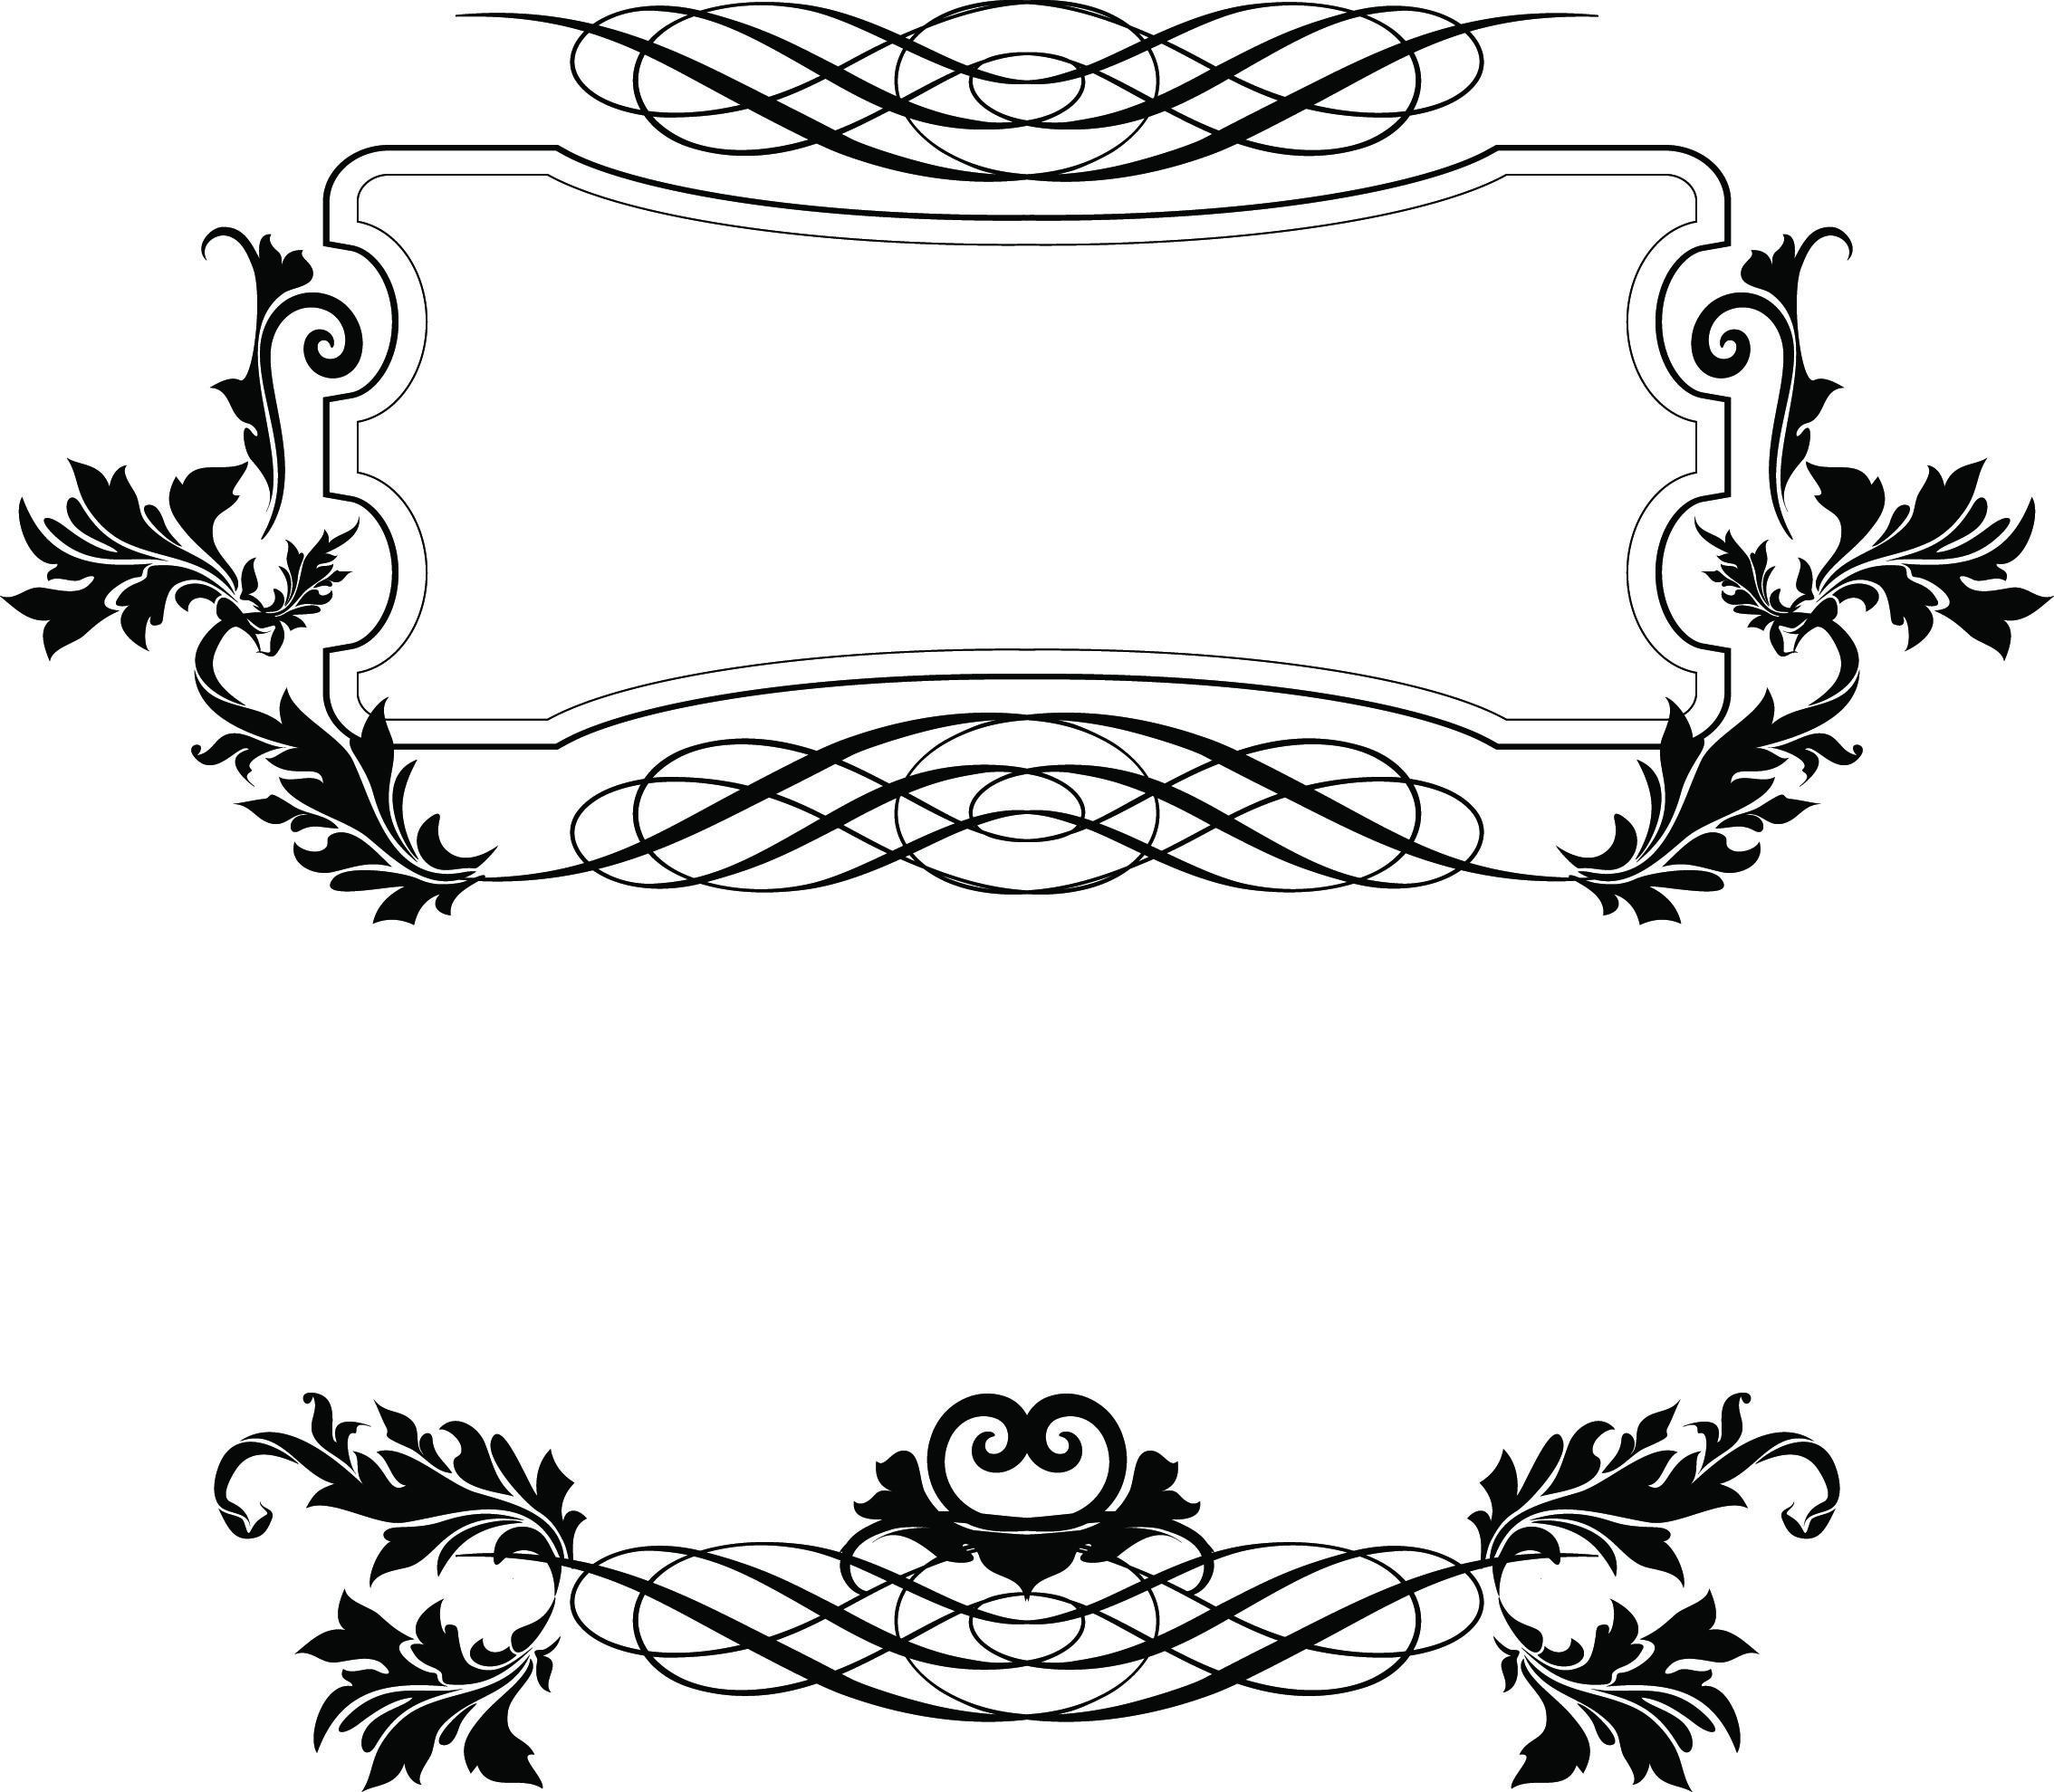 Free Vector Decorative Borders Decorative Borders Border Design Borders And Frames